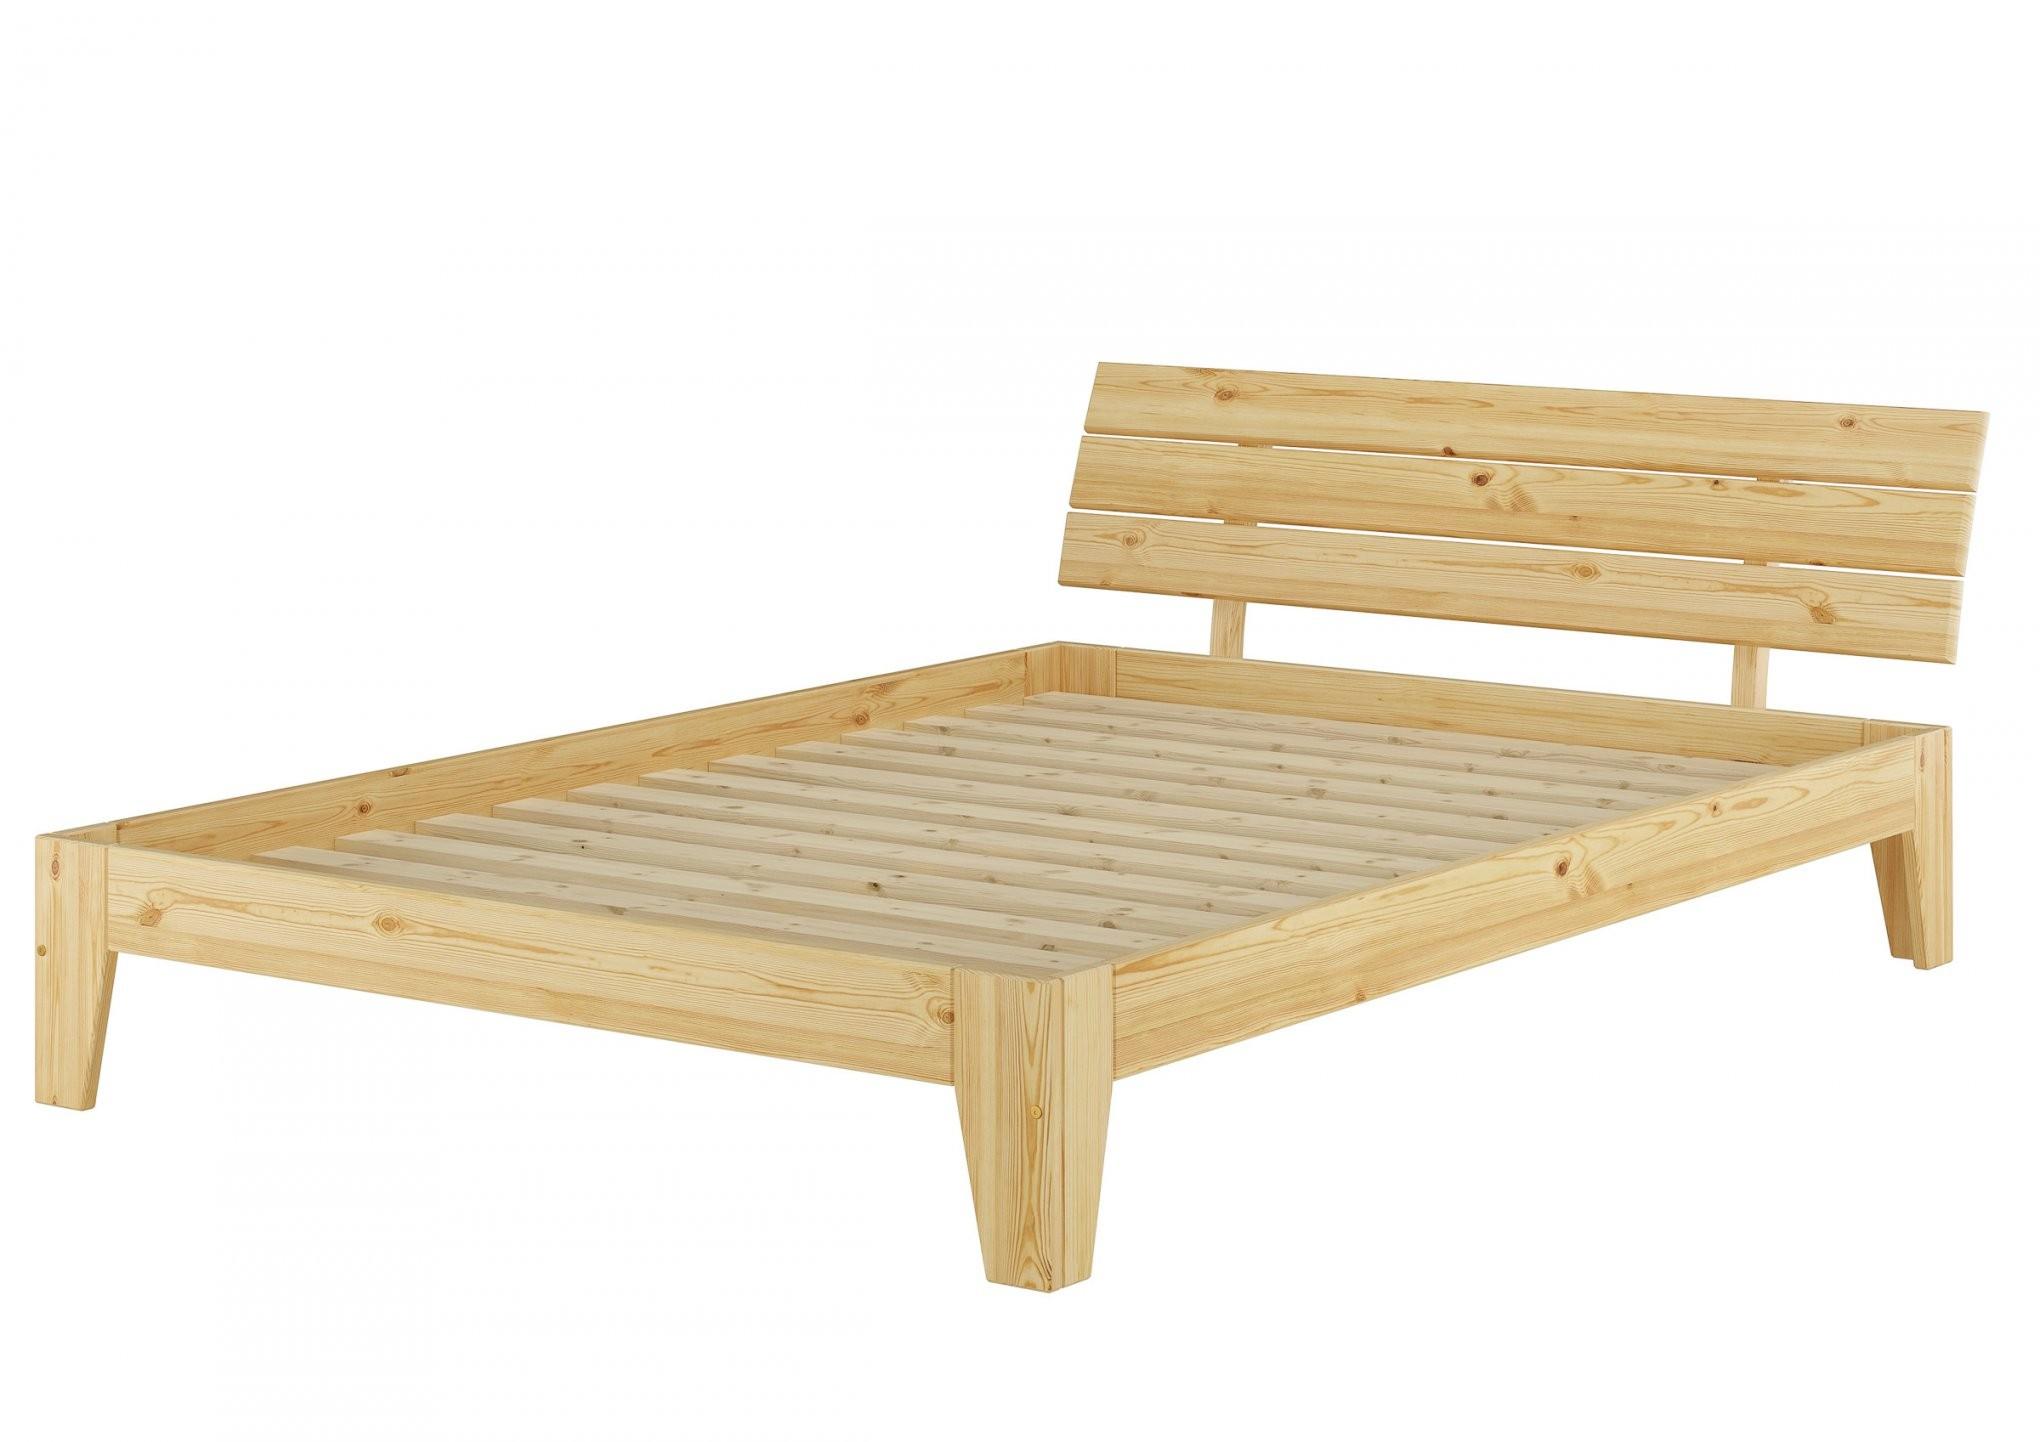 Massivholz Bett 140X200 Mit Rollrost Betten Naturholz Betten Aus von Bettgestell 140X200 Holz Photo